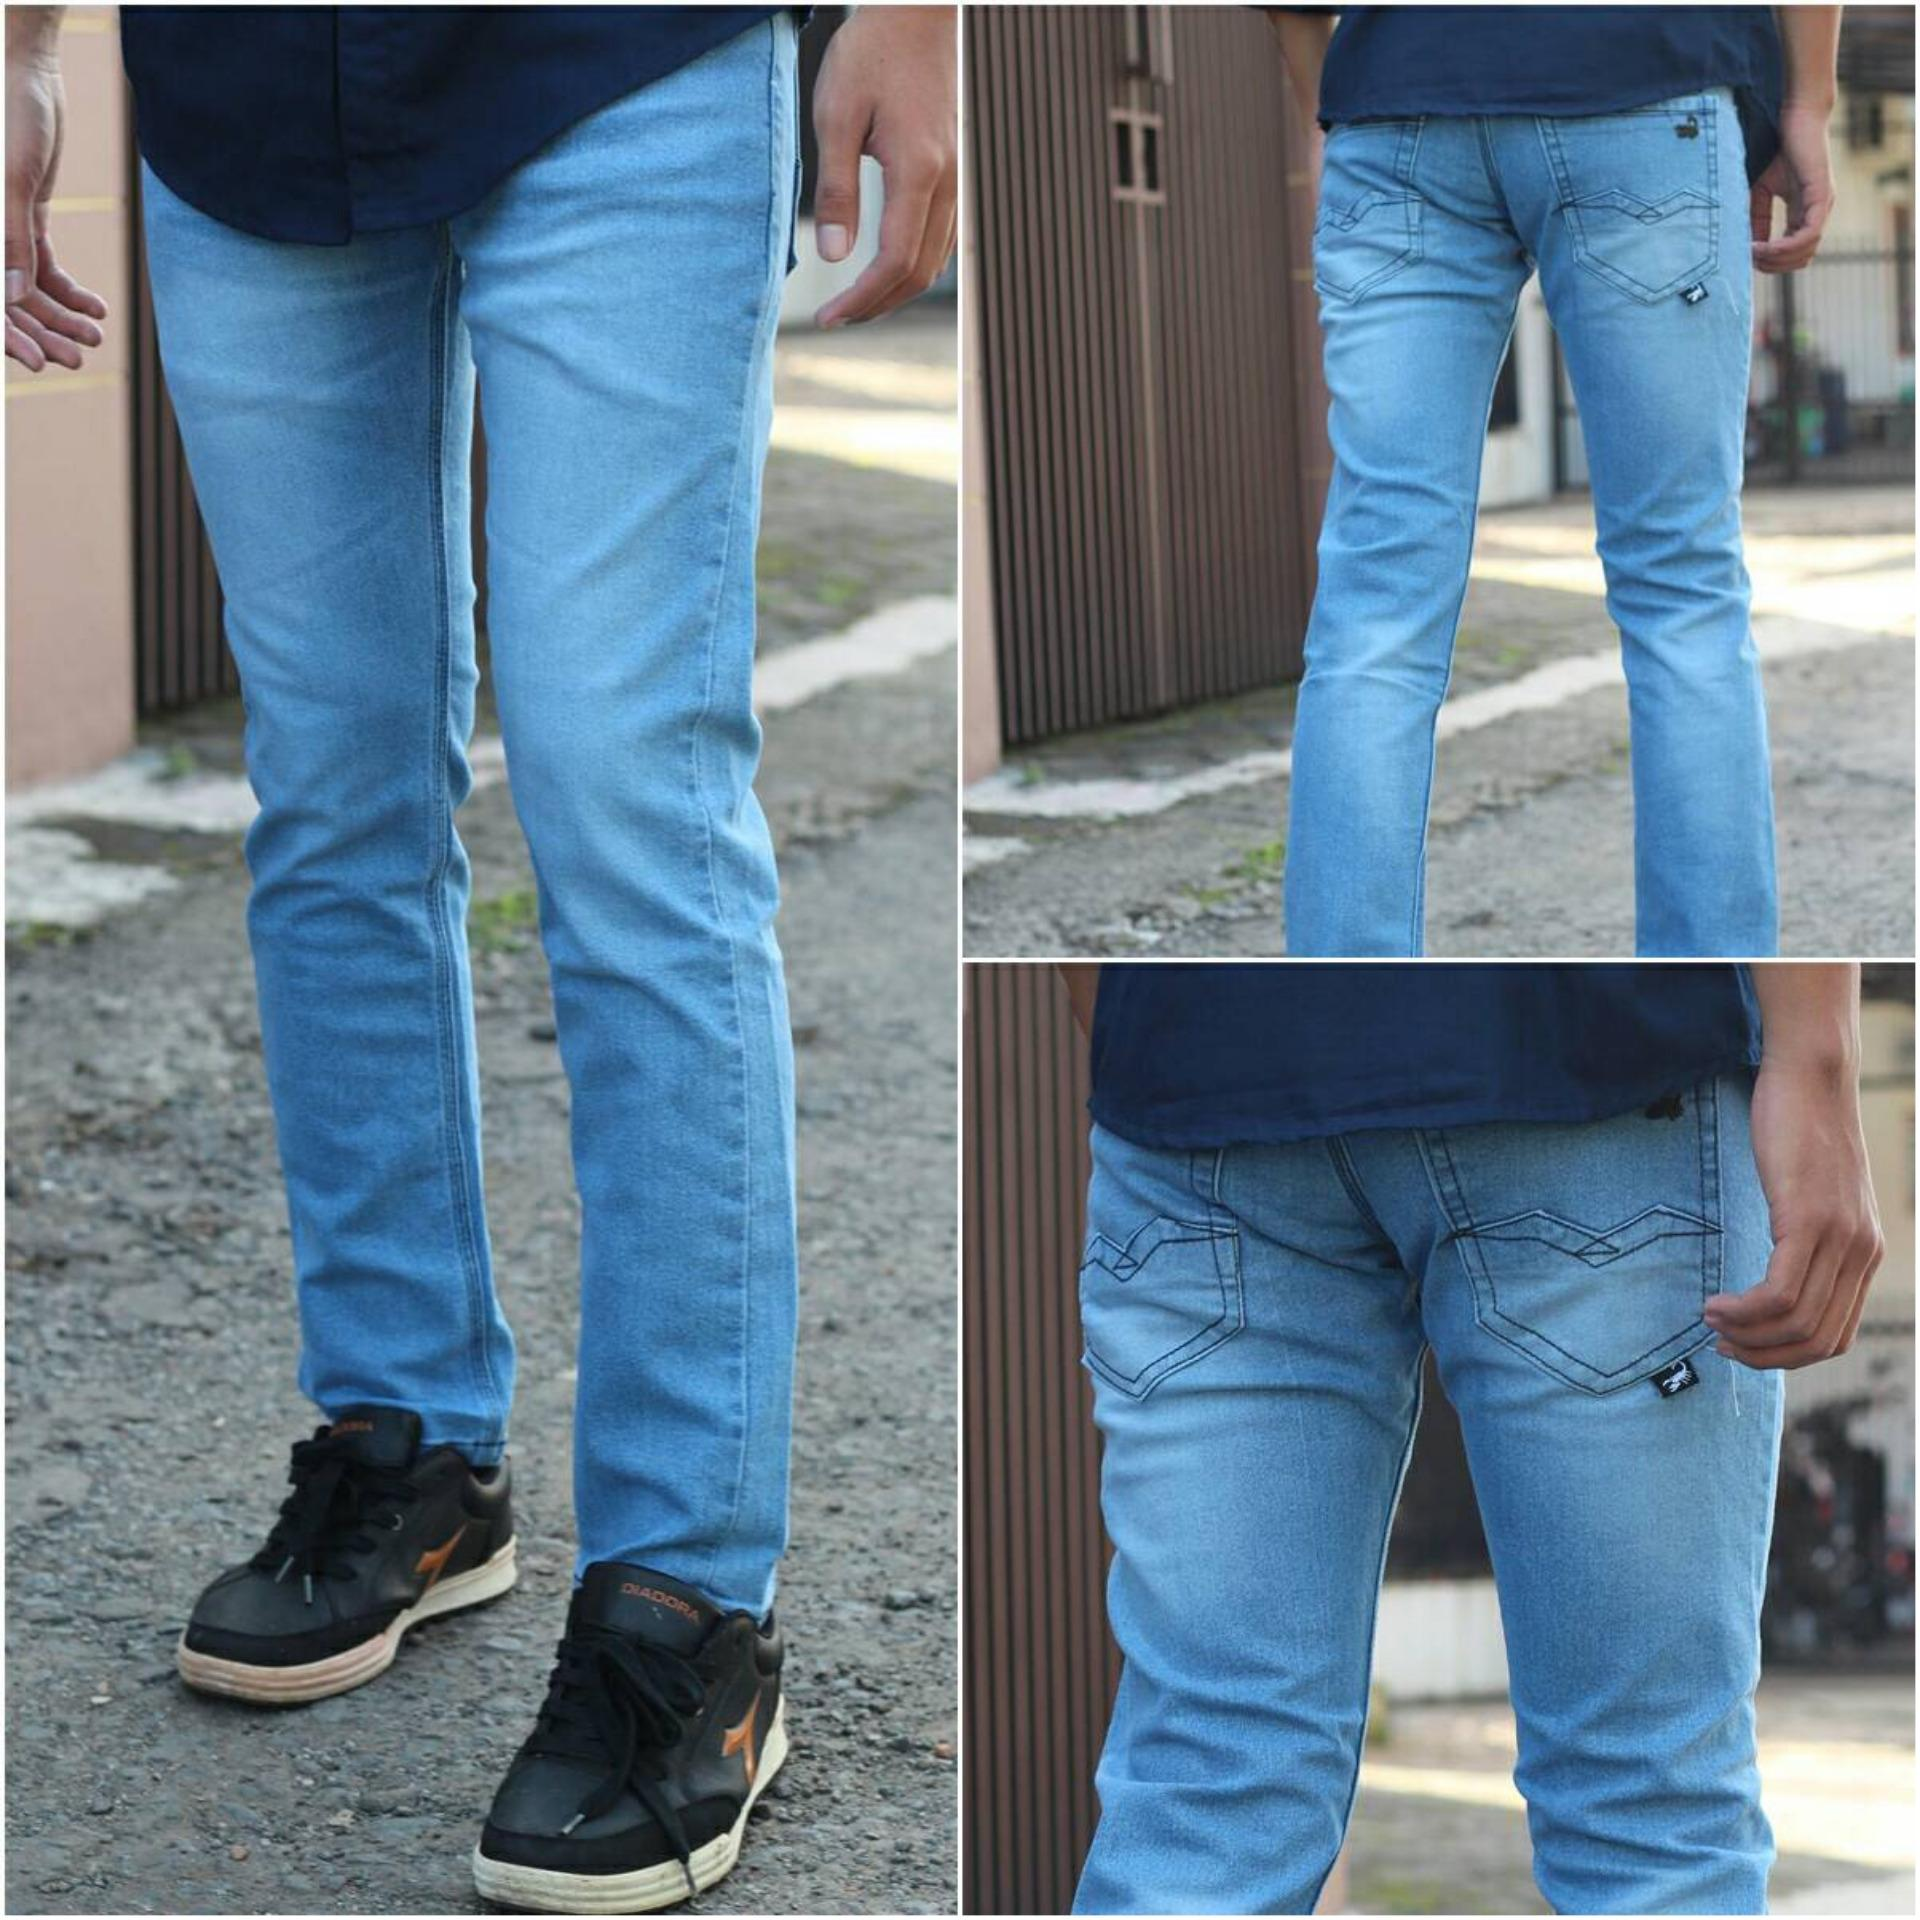 Celana PANJANG Jeans Slimfit Pria - Denim Stretch - Jeans Pensil Melar  - BIO BLITZ